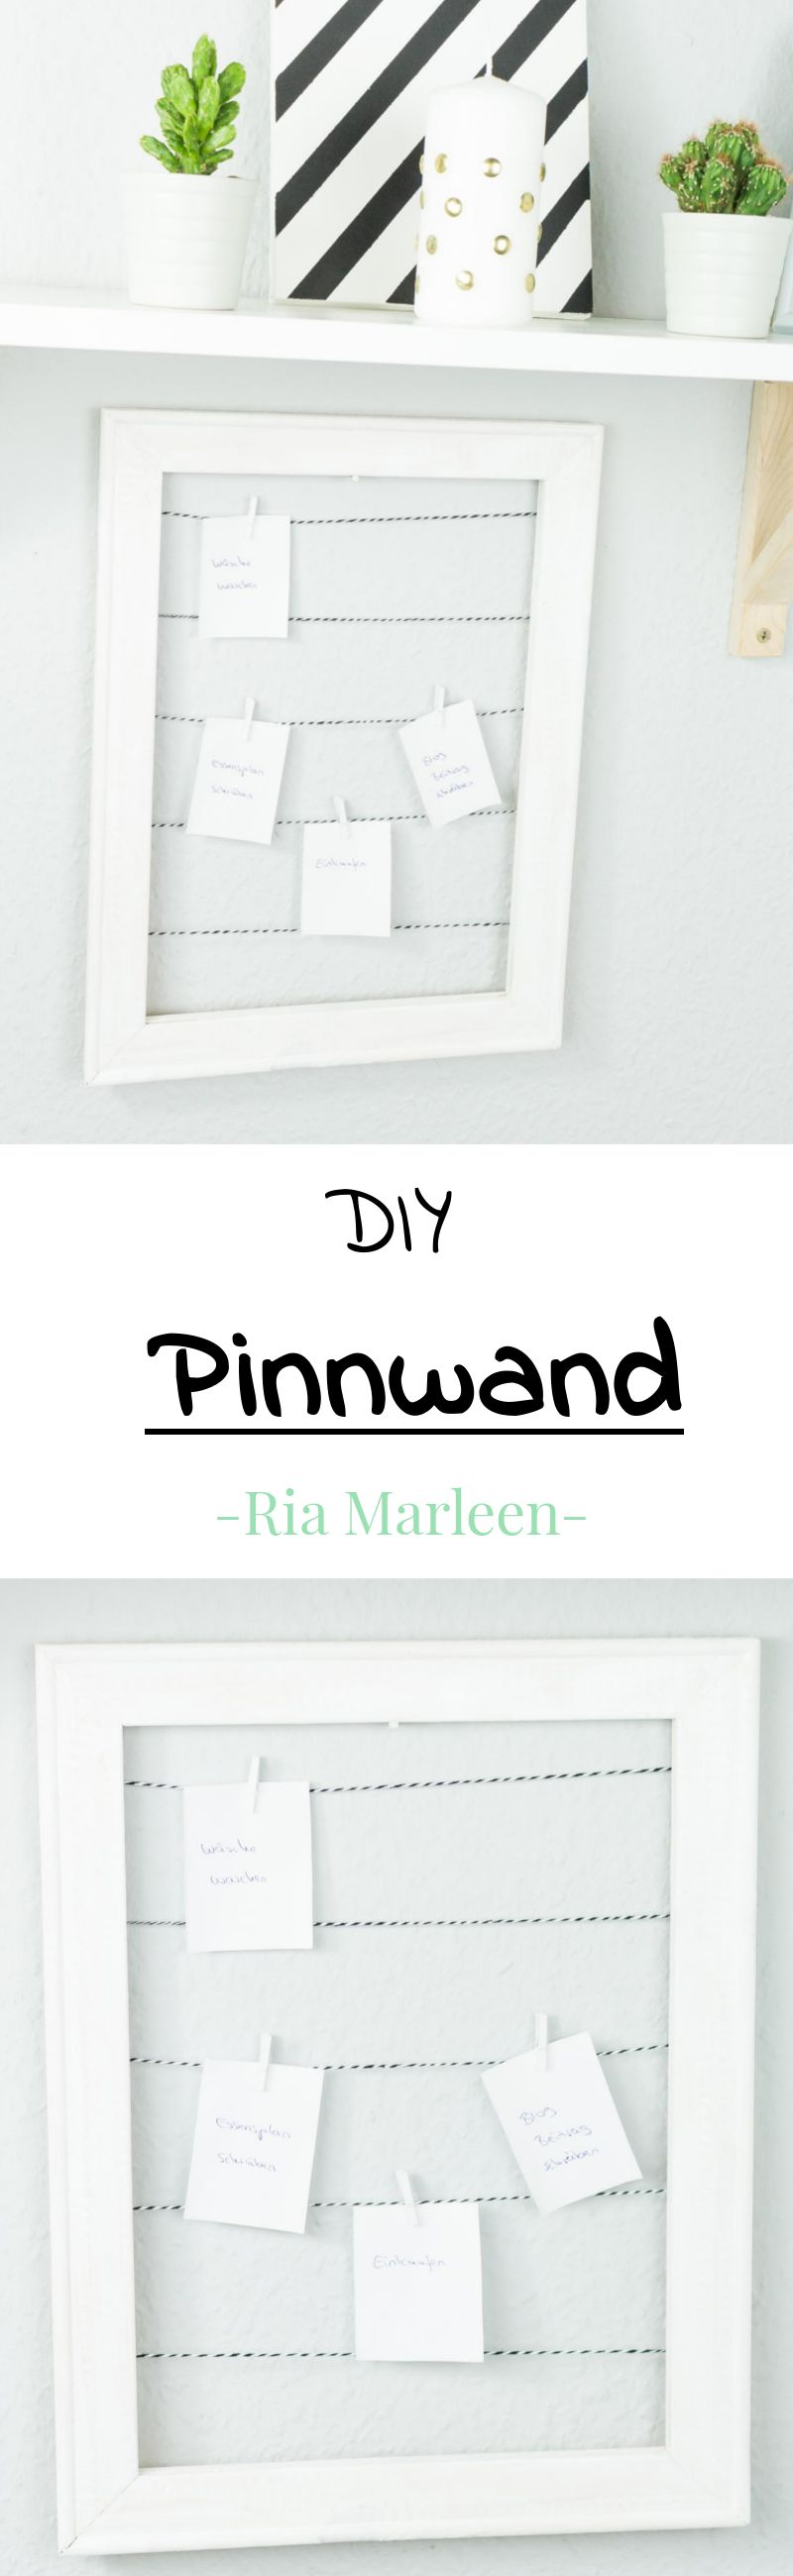 DIY Pinnwand aus Holzrahmen basteln - schnelle Upcycling Idee | DIY ...